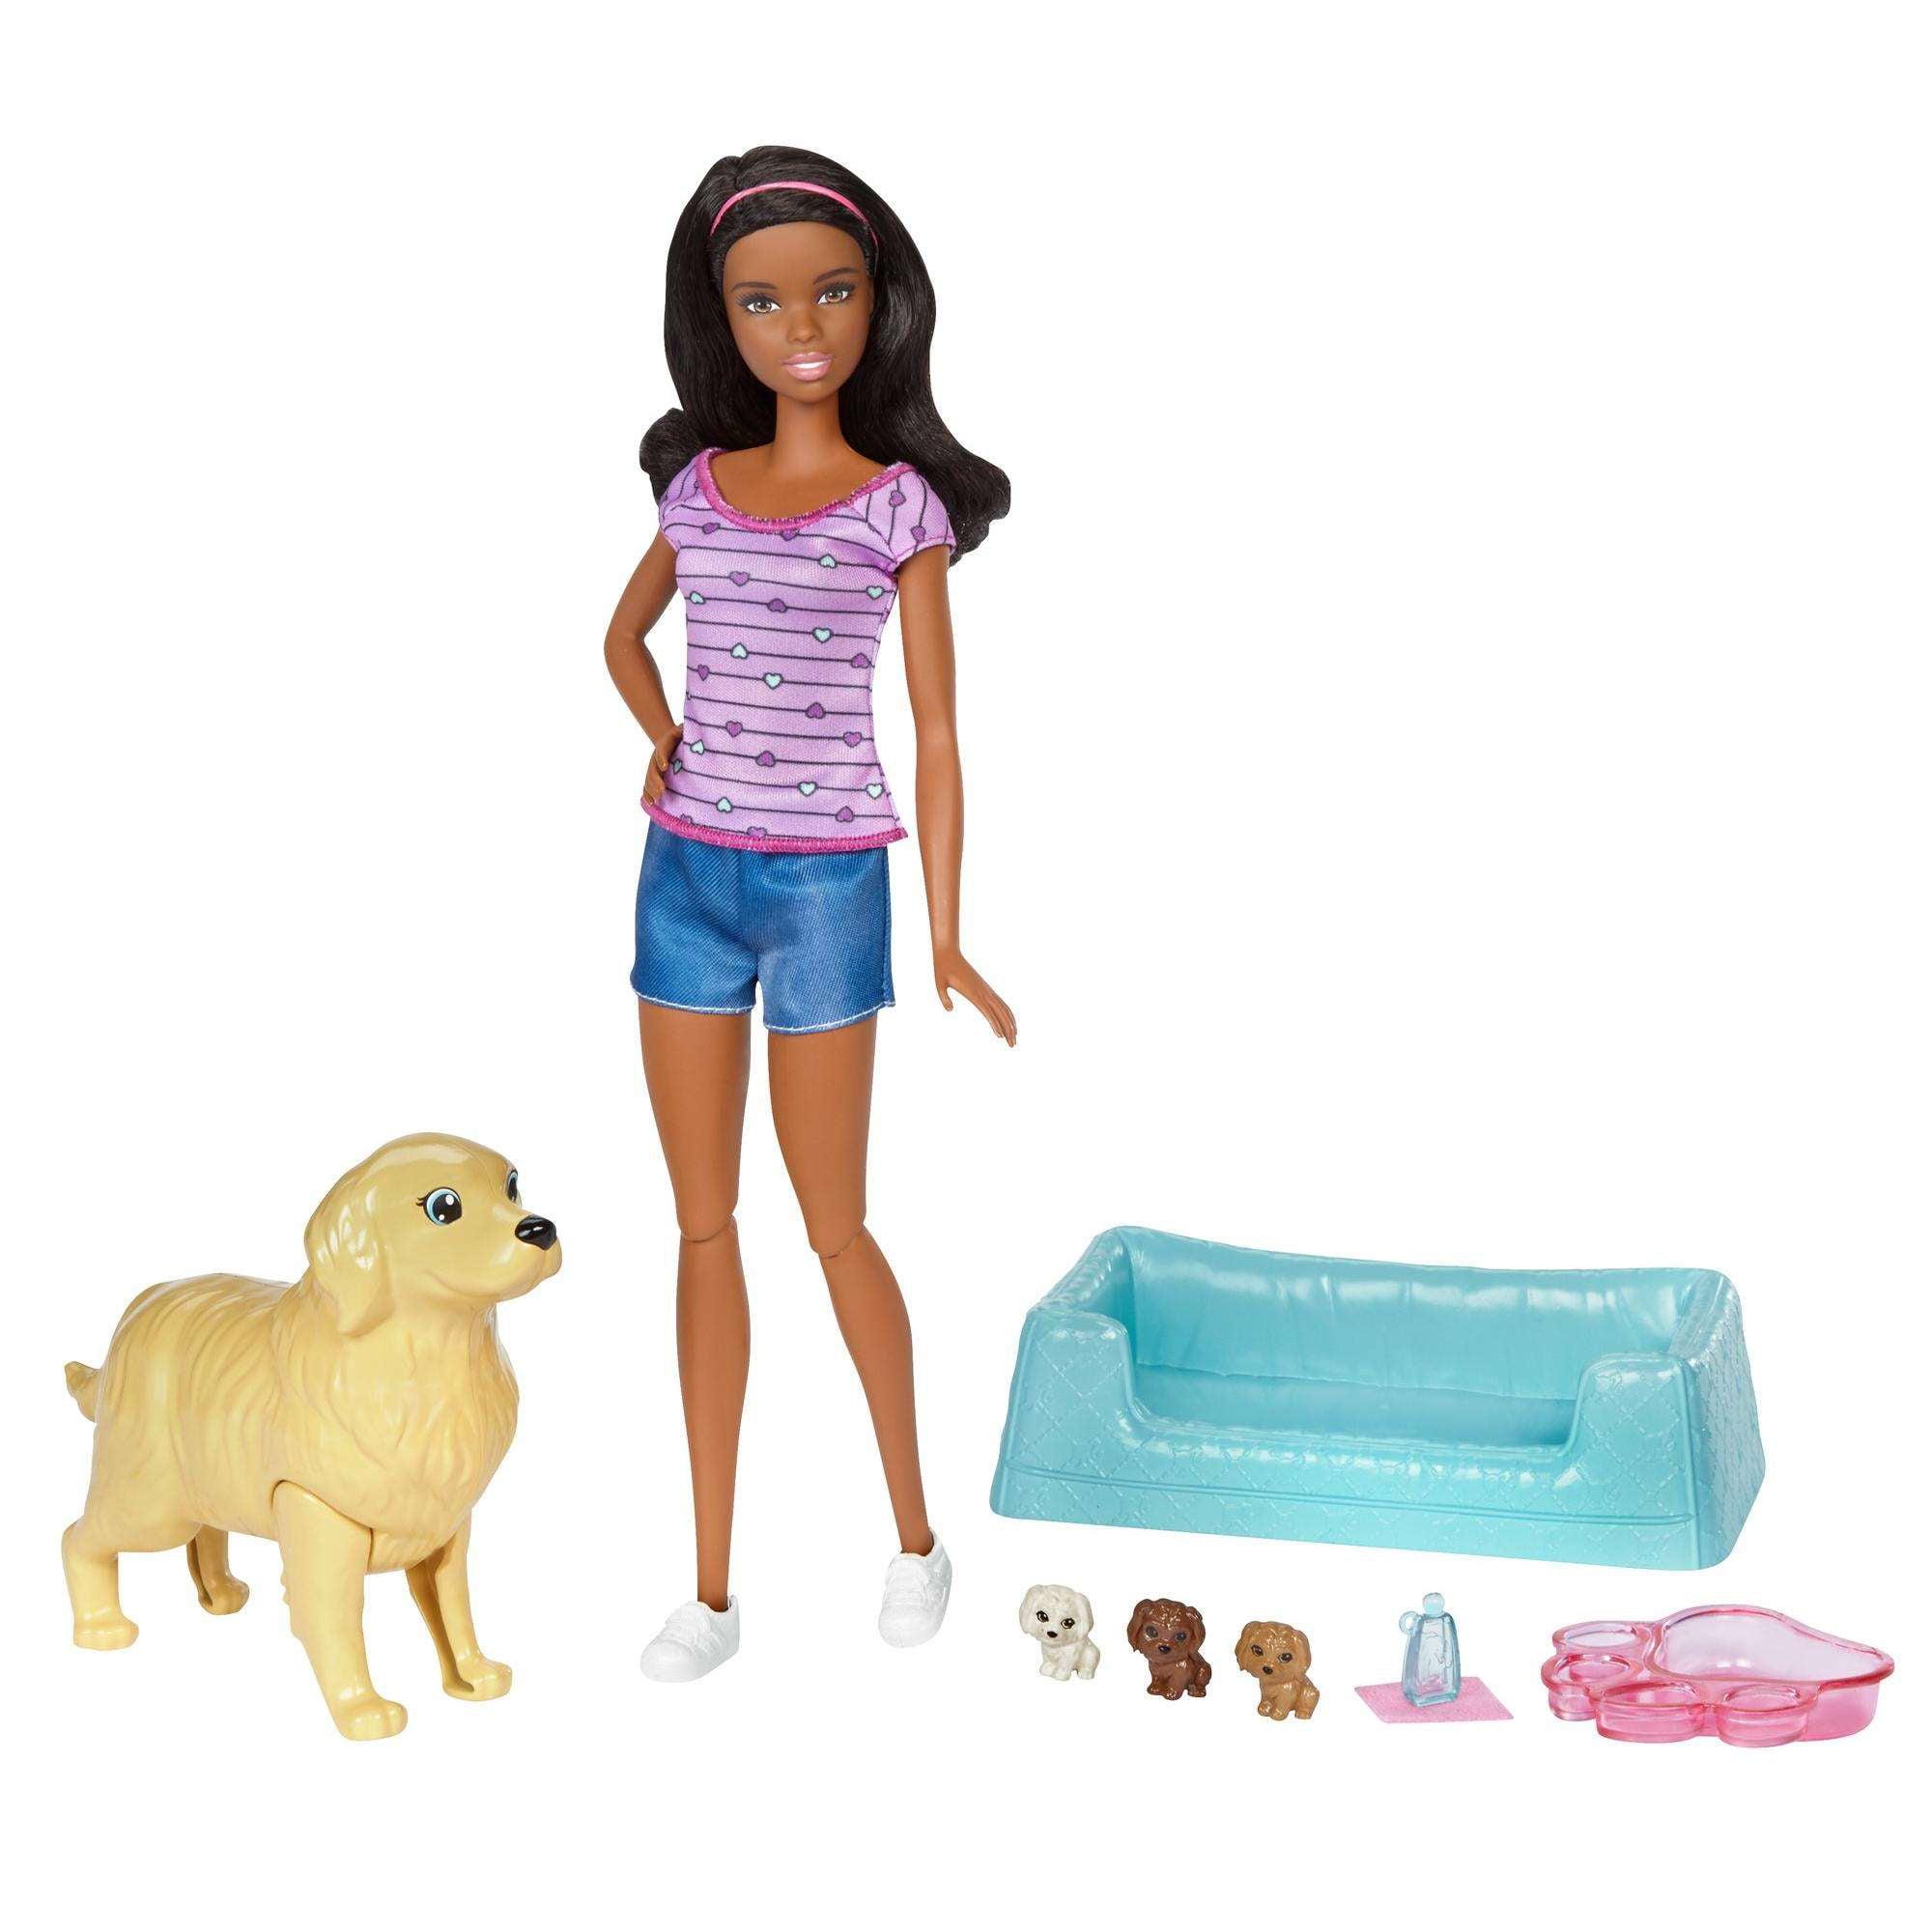 Barbie Newborn Pups African-American Doll & Pets by Mattel